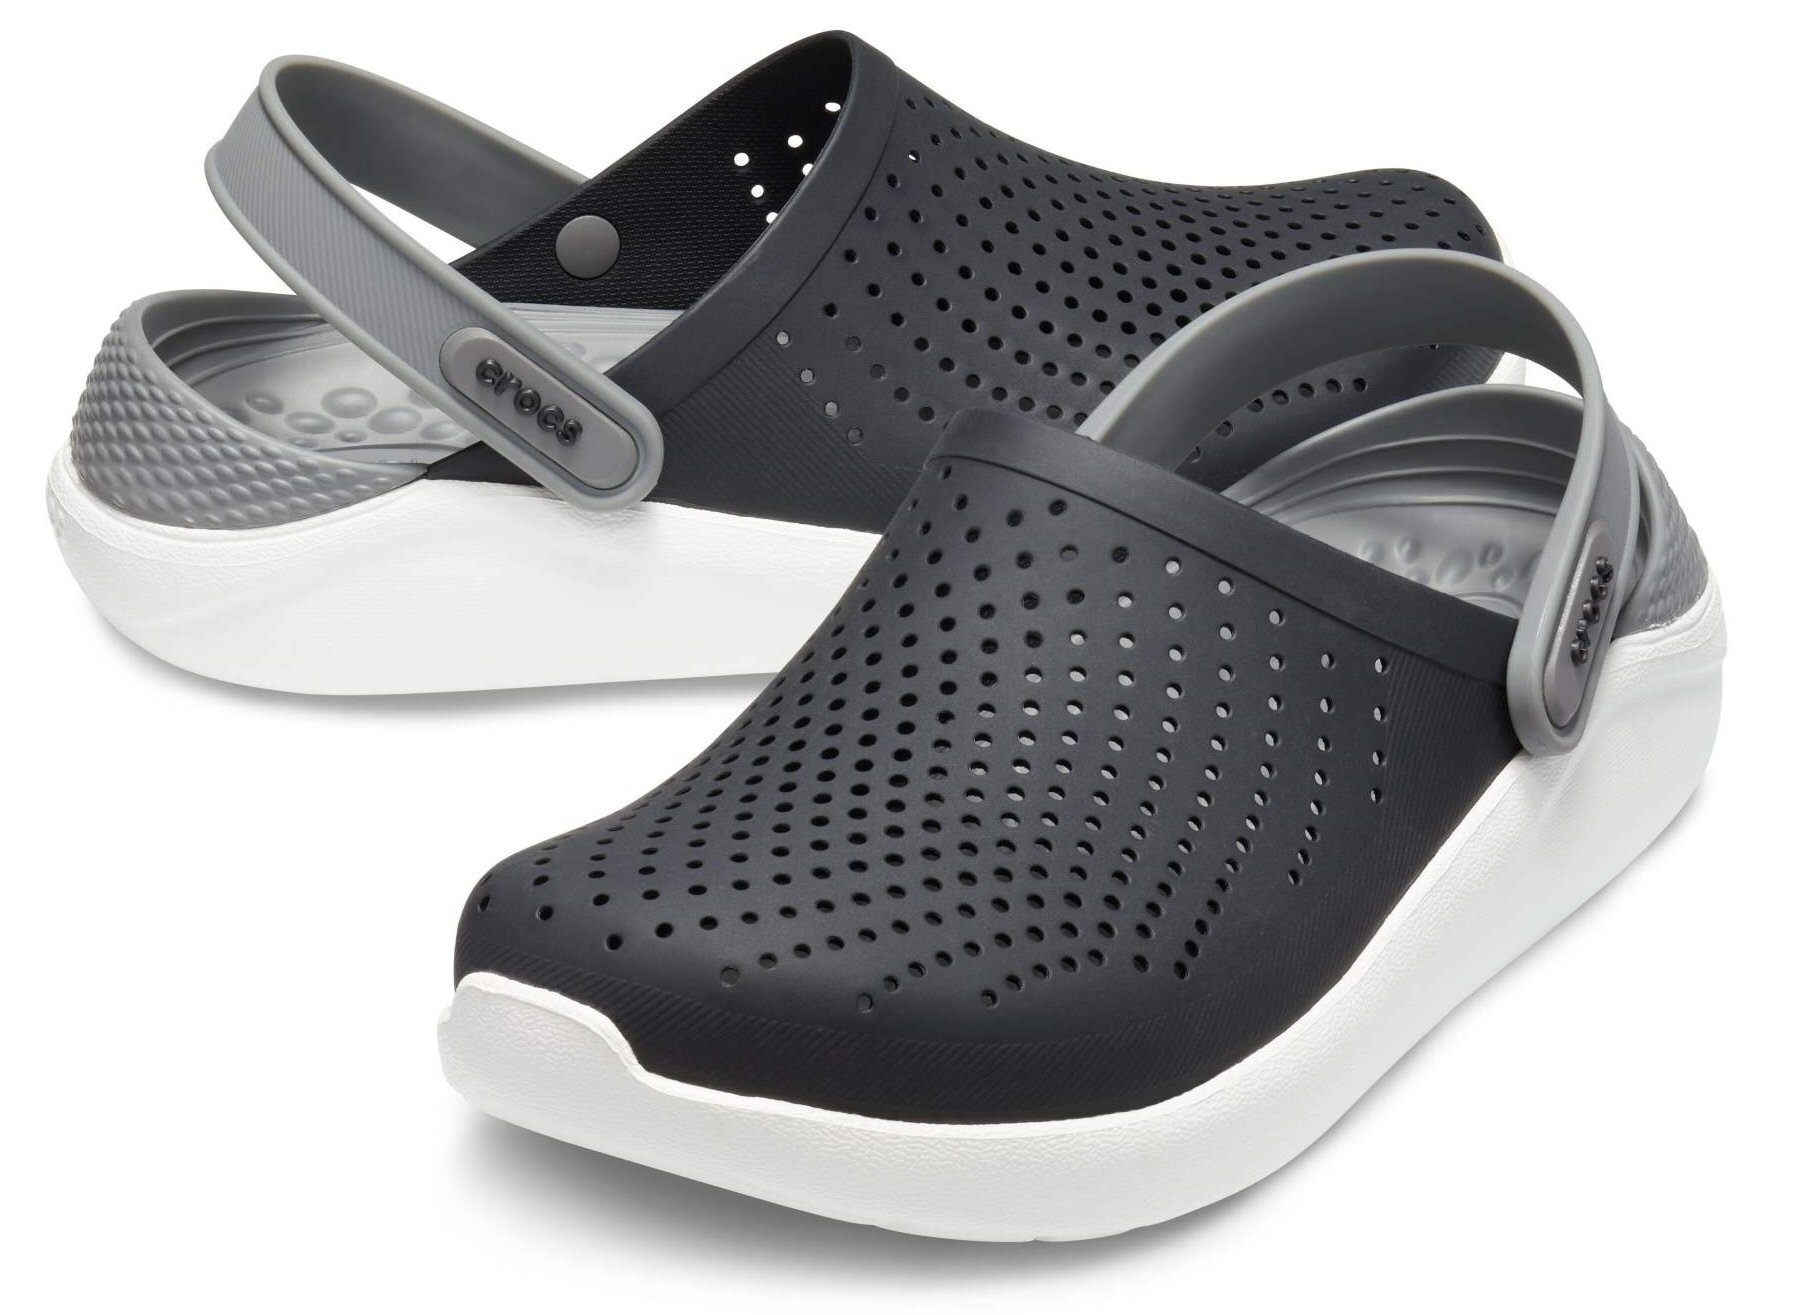 new product 75a98 f7880 Crocs LiteRide Cloq 2019 schwarz/grau Sandale Herren